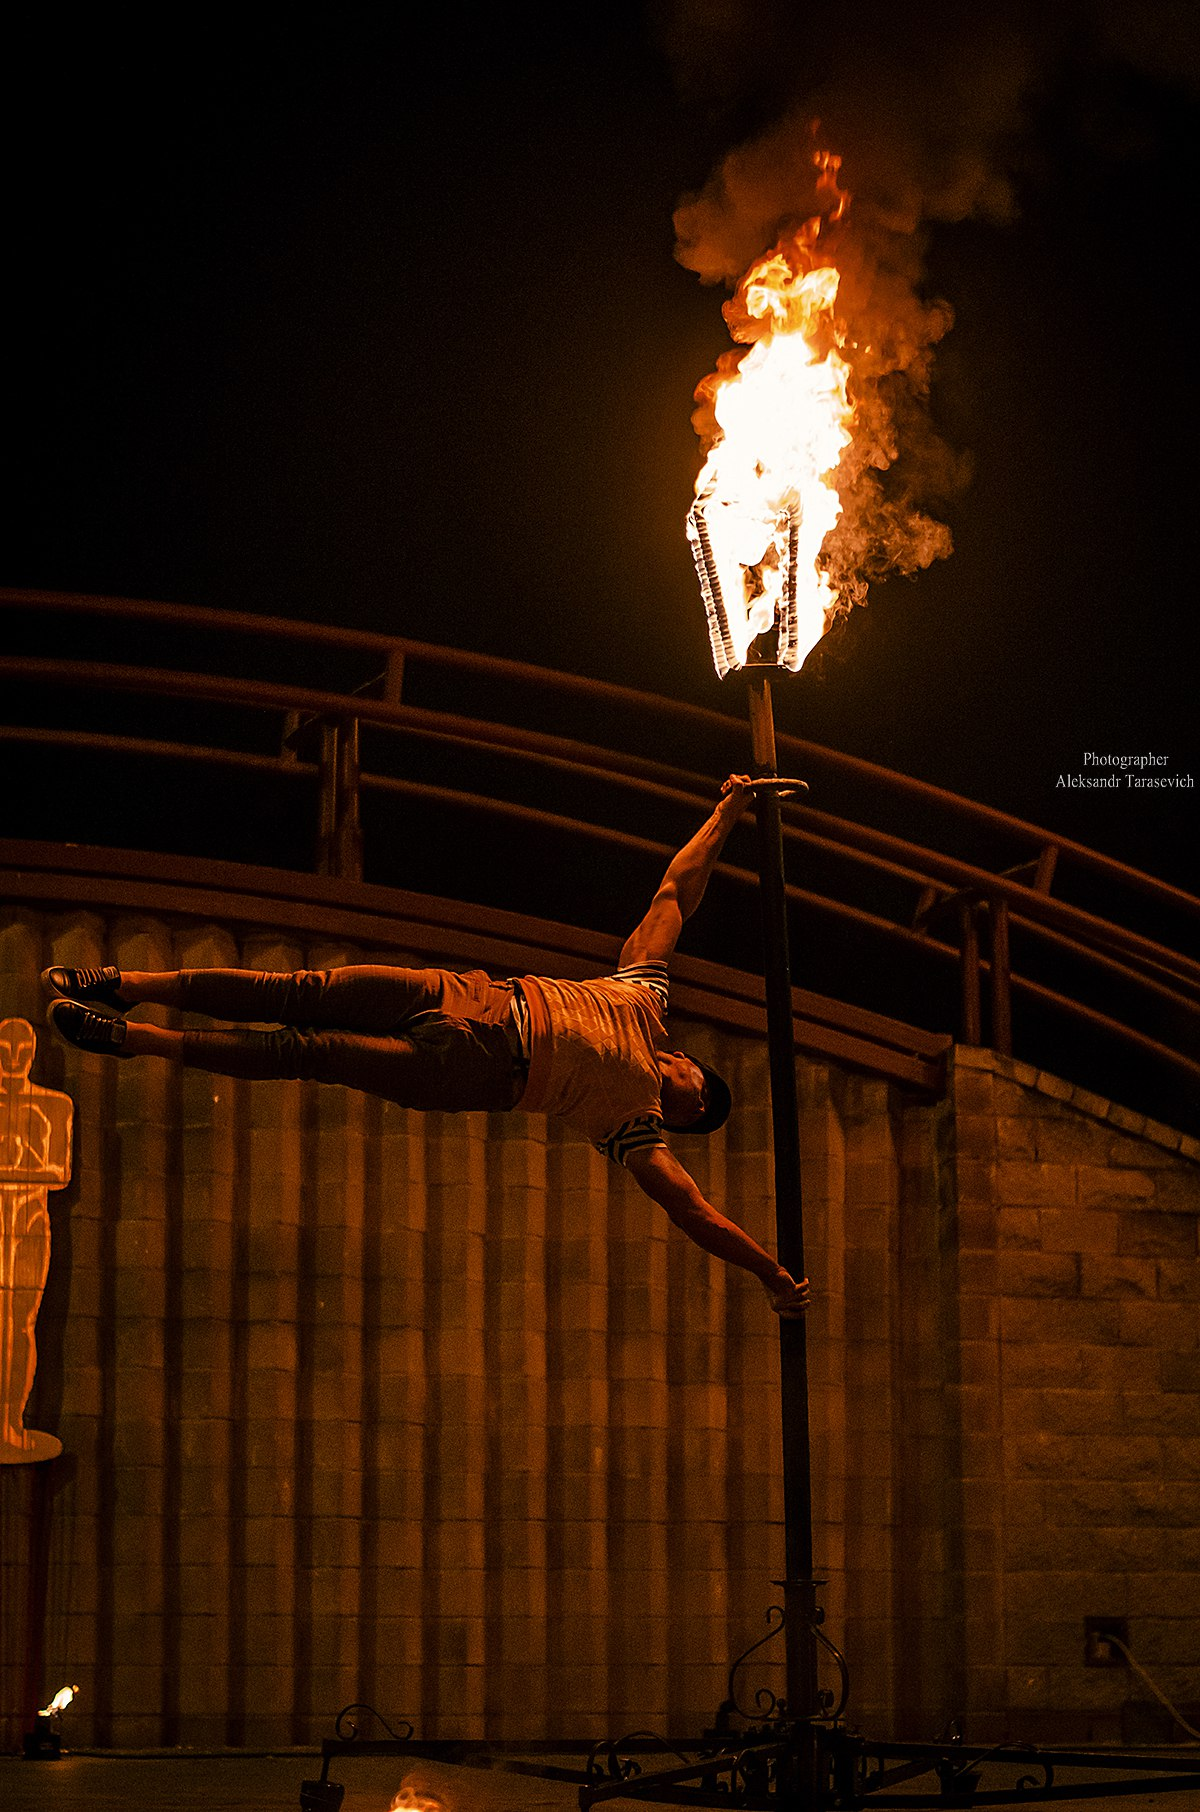 Фаер Шоу KRESIVA (огненный цирк) ГИМНАСТ НА ГОРЯЩЕМ ФОНАРЕ ЕВГЕНИЙ ГАГАРИН  ОГНИ ОСЕНИ 2016